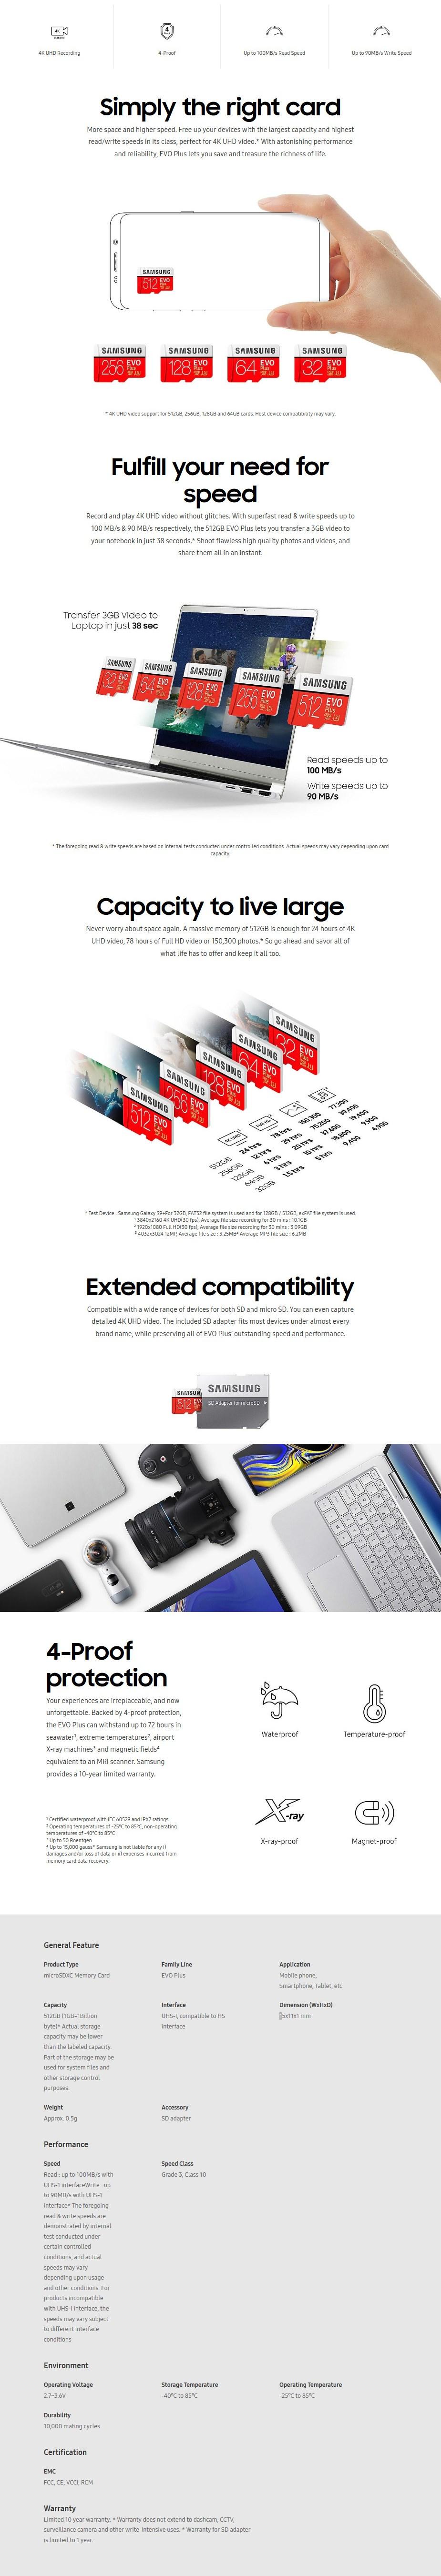 Samsung 512GB MicroSDXC EVO Plus UHS-I Class 10 Memory Card - 100MB/s - Desktop Overview 1